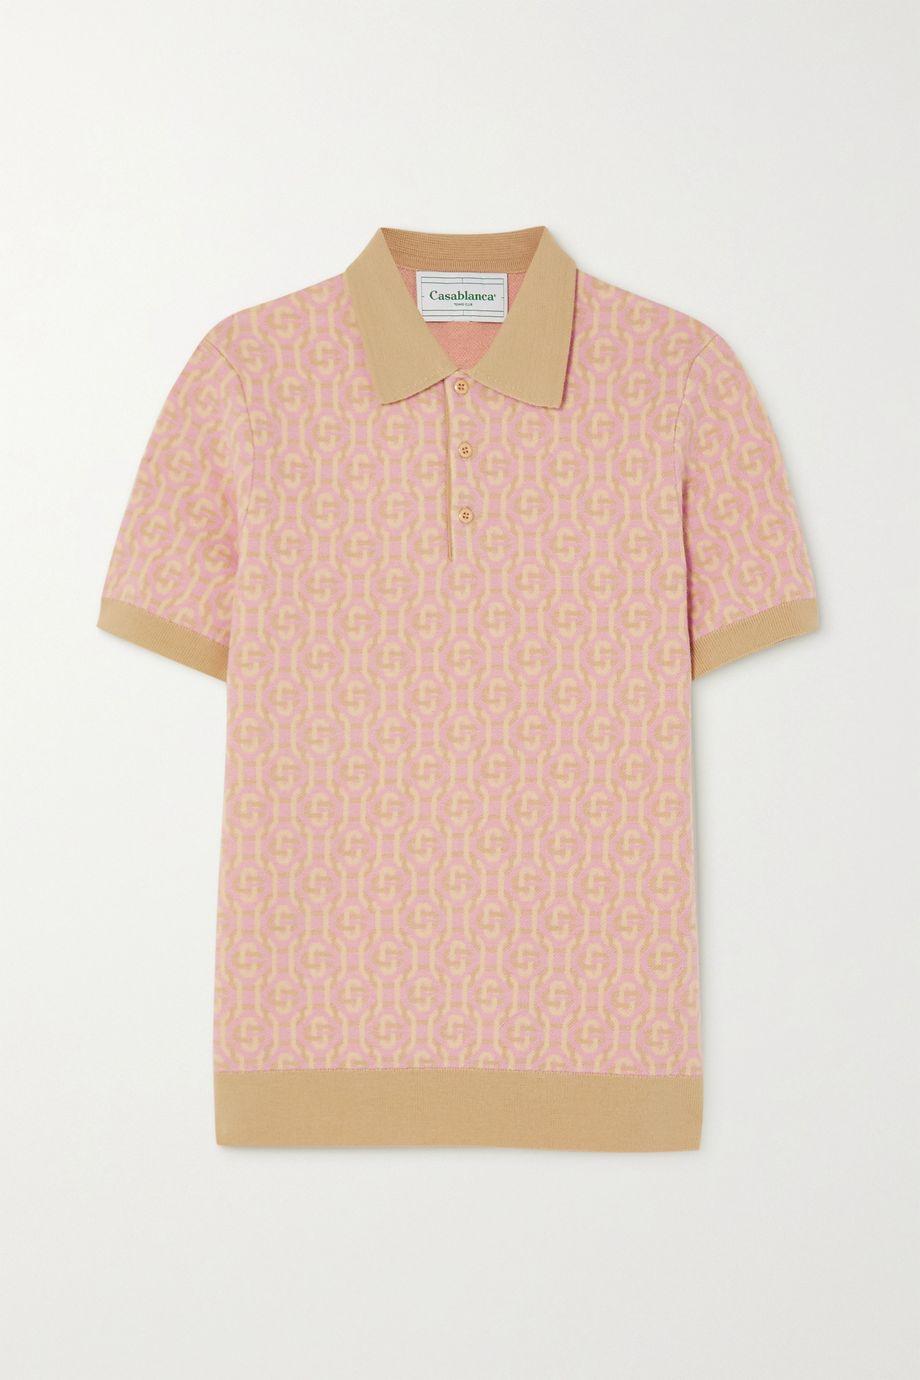 Casablanca Wool-jacquard polo shirt